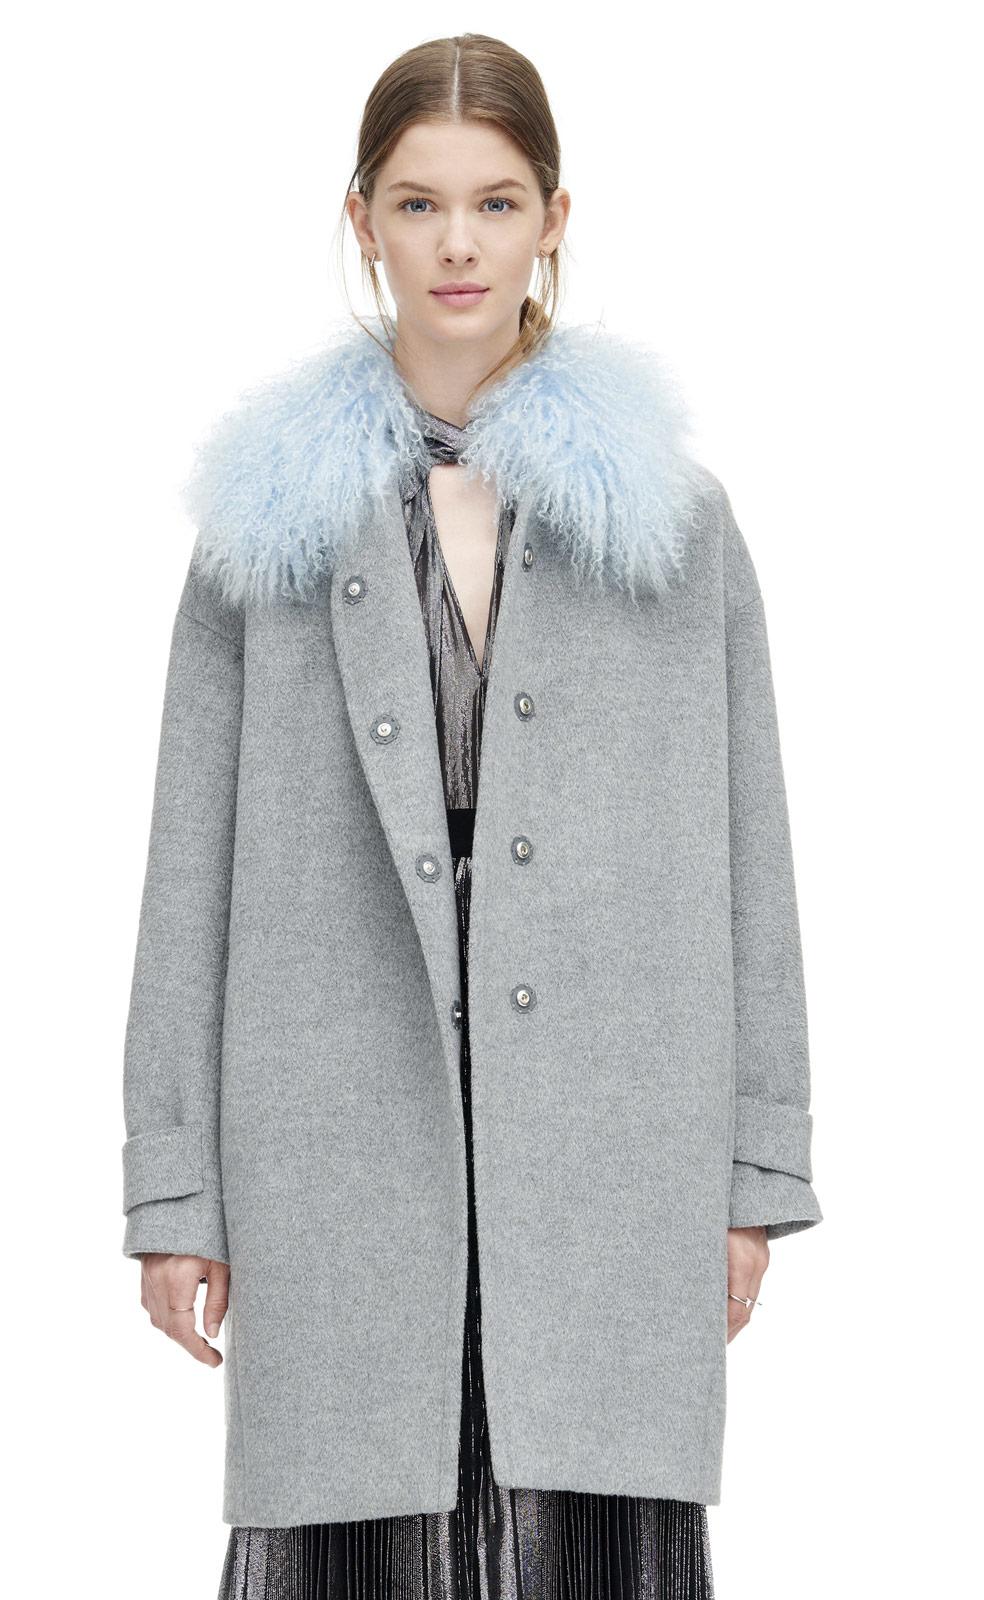 Rebecca taylor Wool Shearling Cocoon Winter Coat in Gray | Lyst